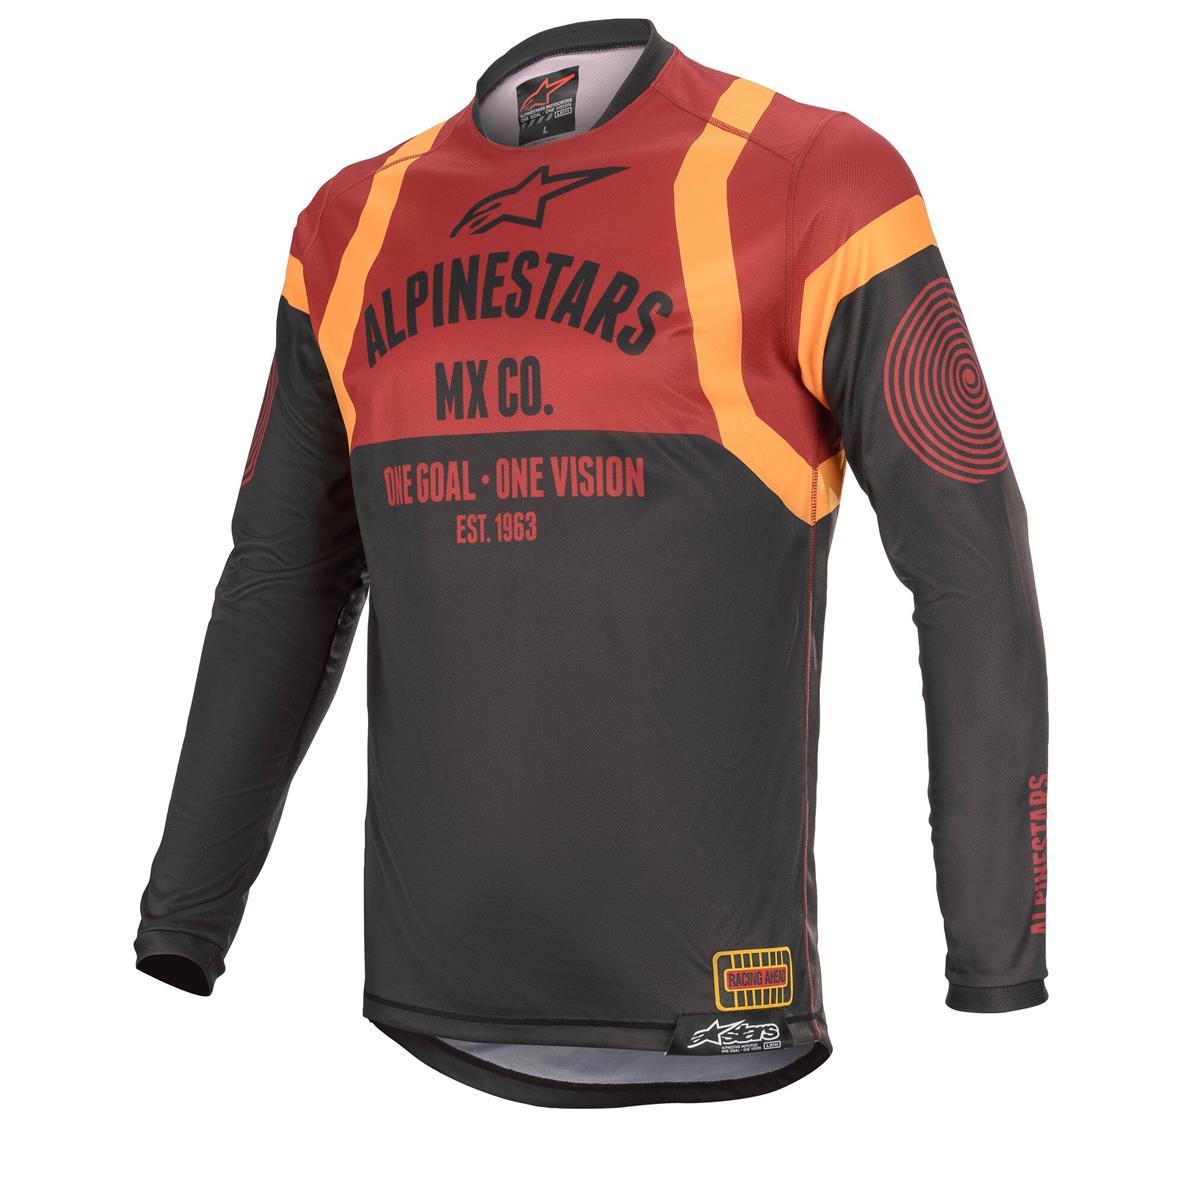 Alpinestars Jersey Racer Tech Flagship - Schwarz/Bordeaux/Orange